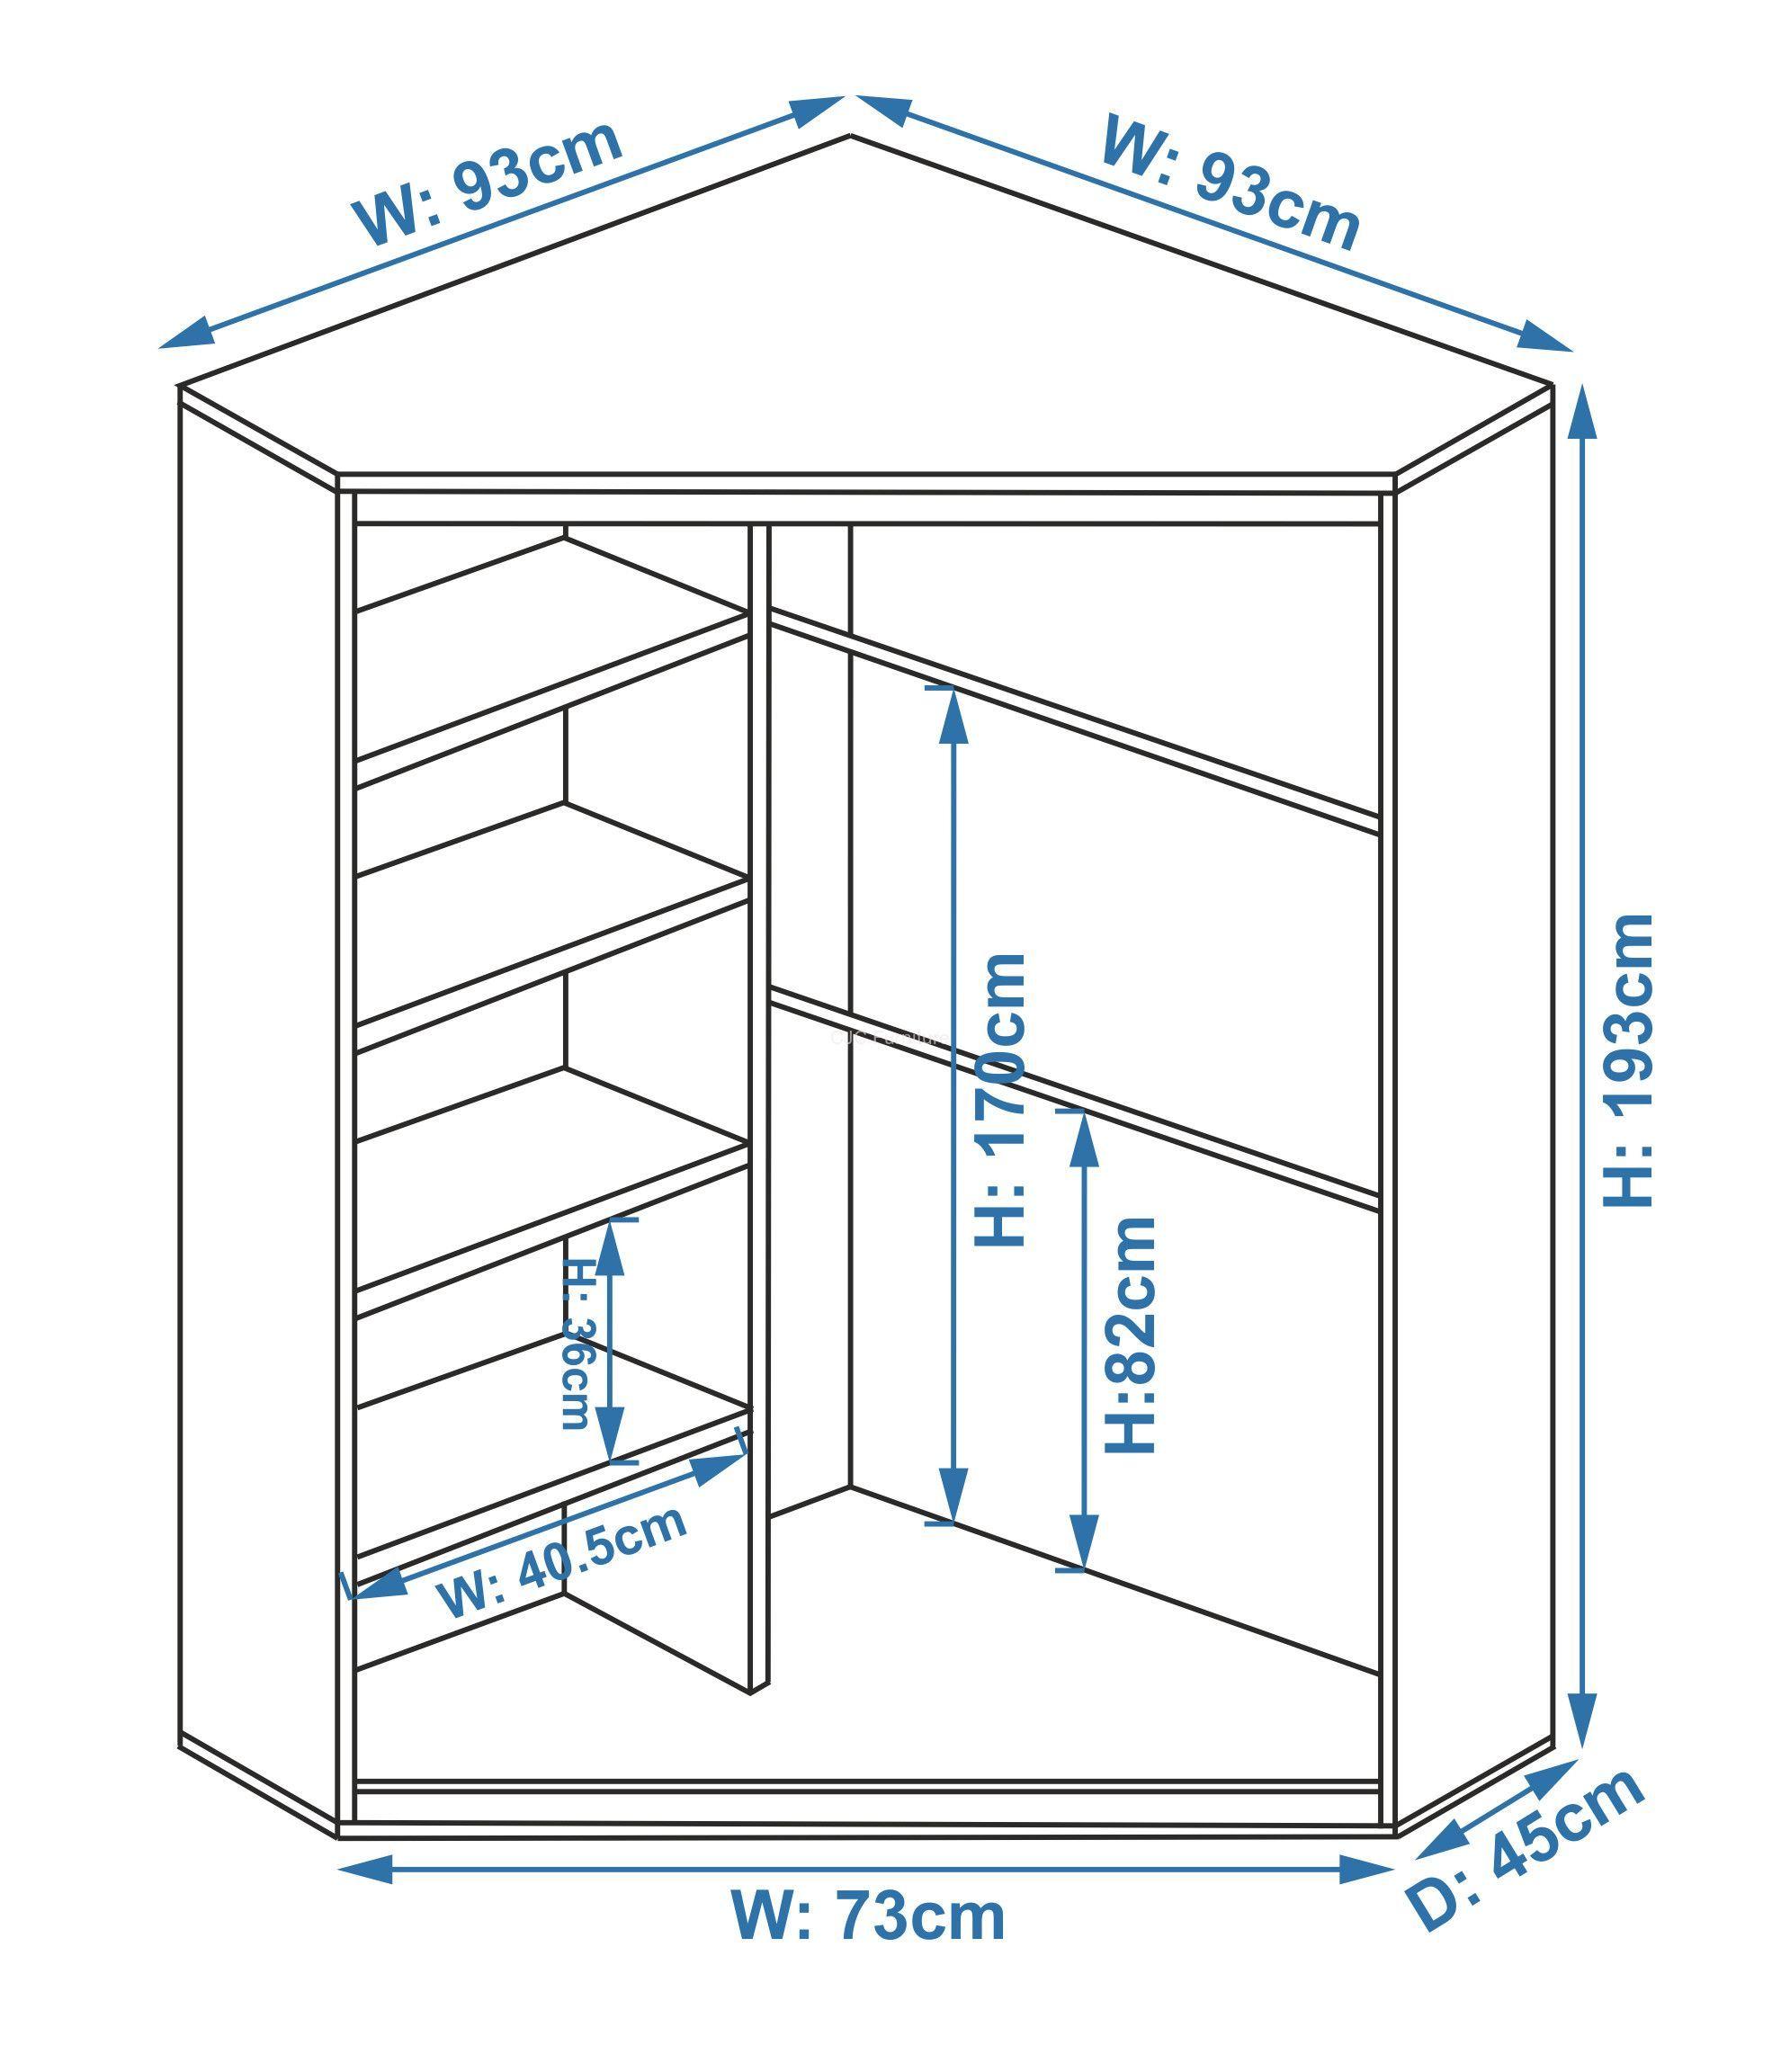 Armadio Piccolo Ad Angolo armoireclothescloset | yatak odası dolap düzenleme, dolaplar